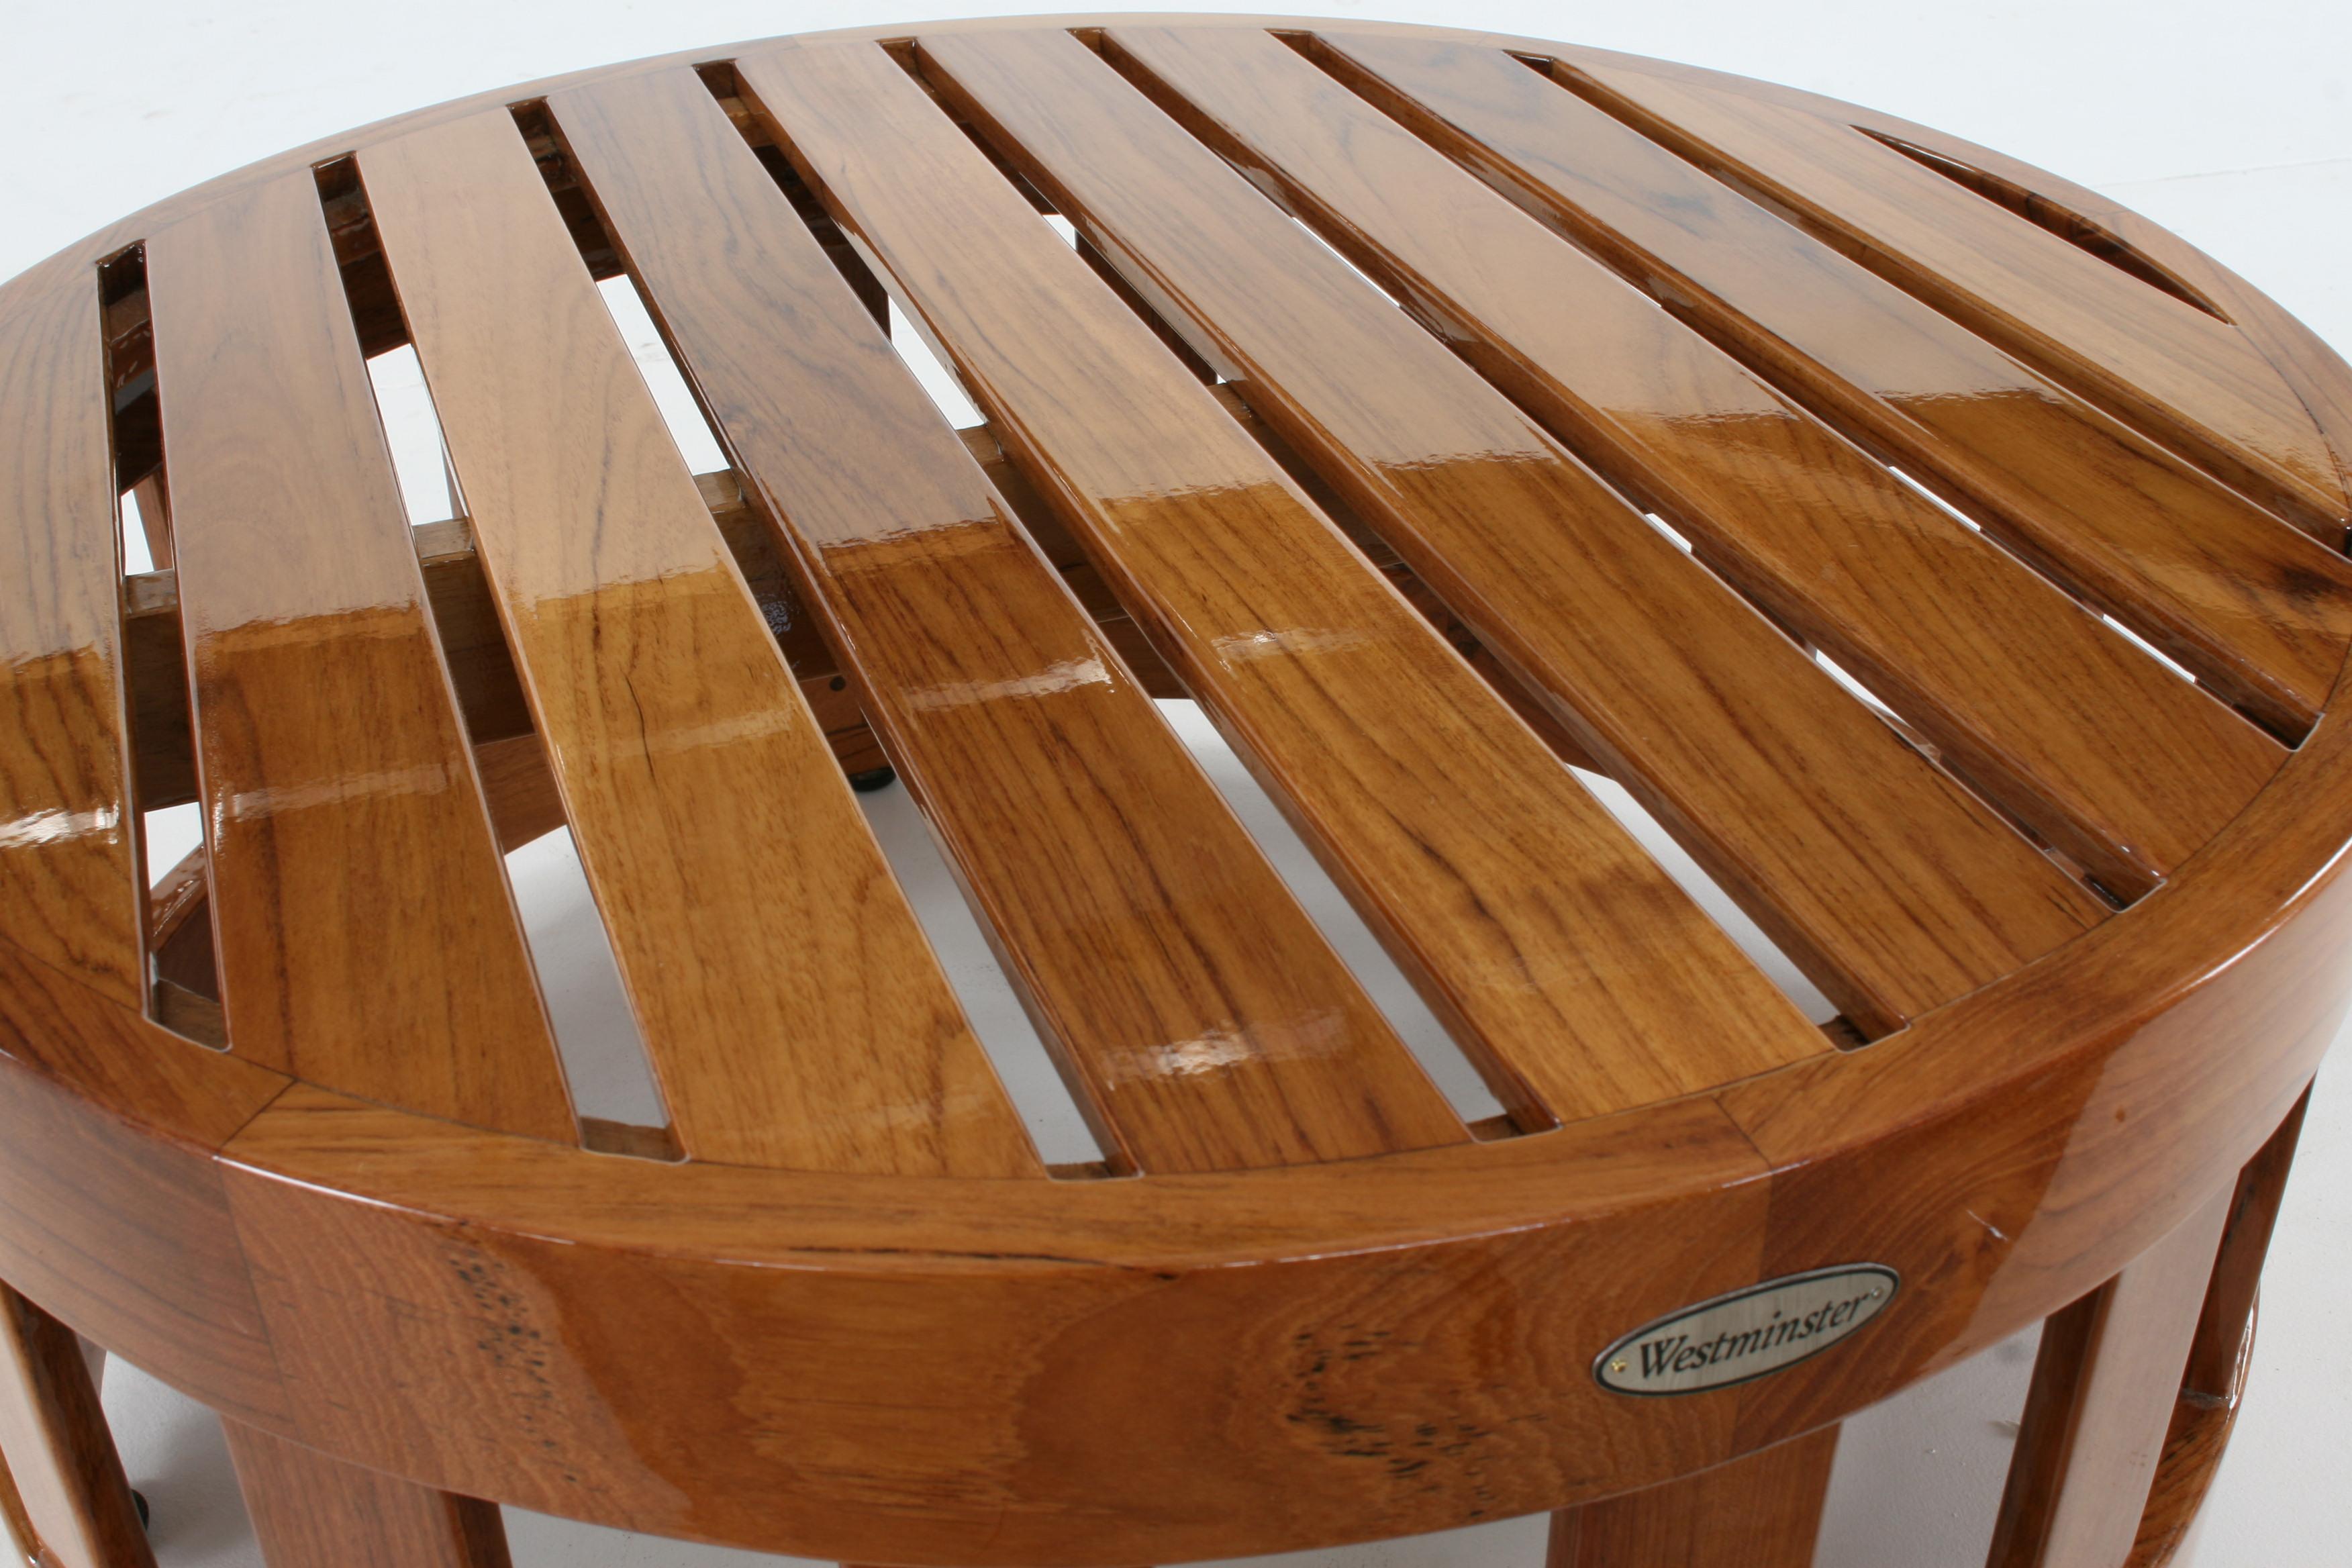 Teak Yacht Furniture Westminster Teak Furniture